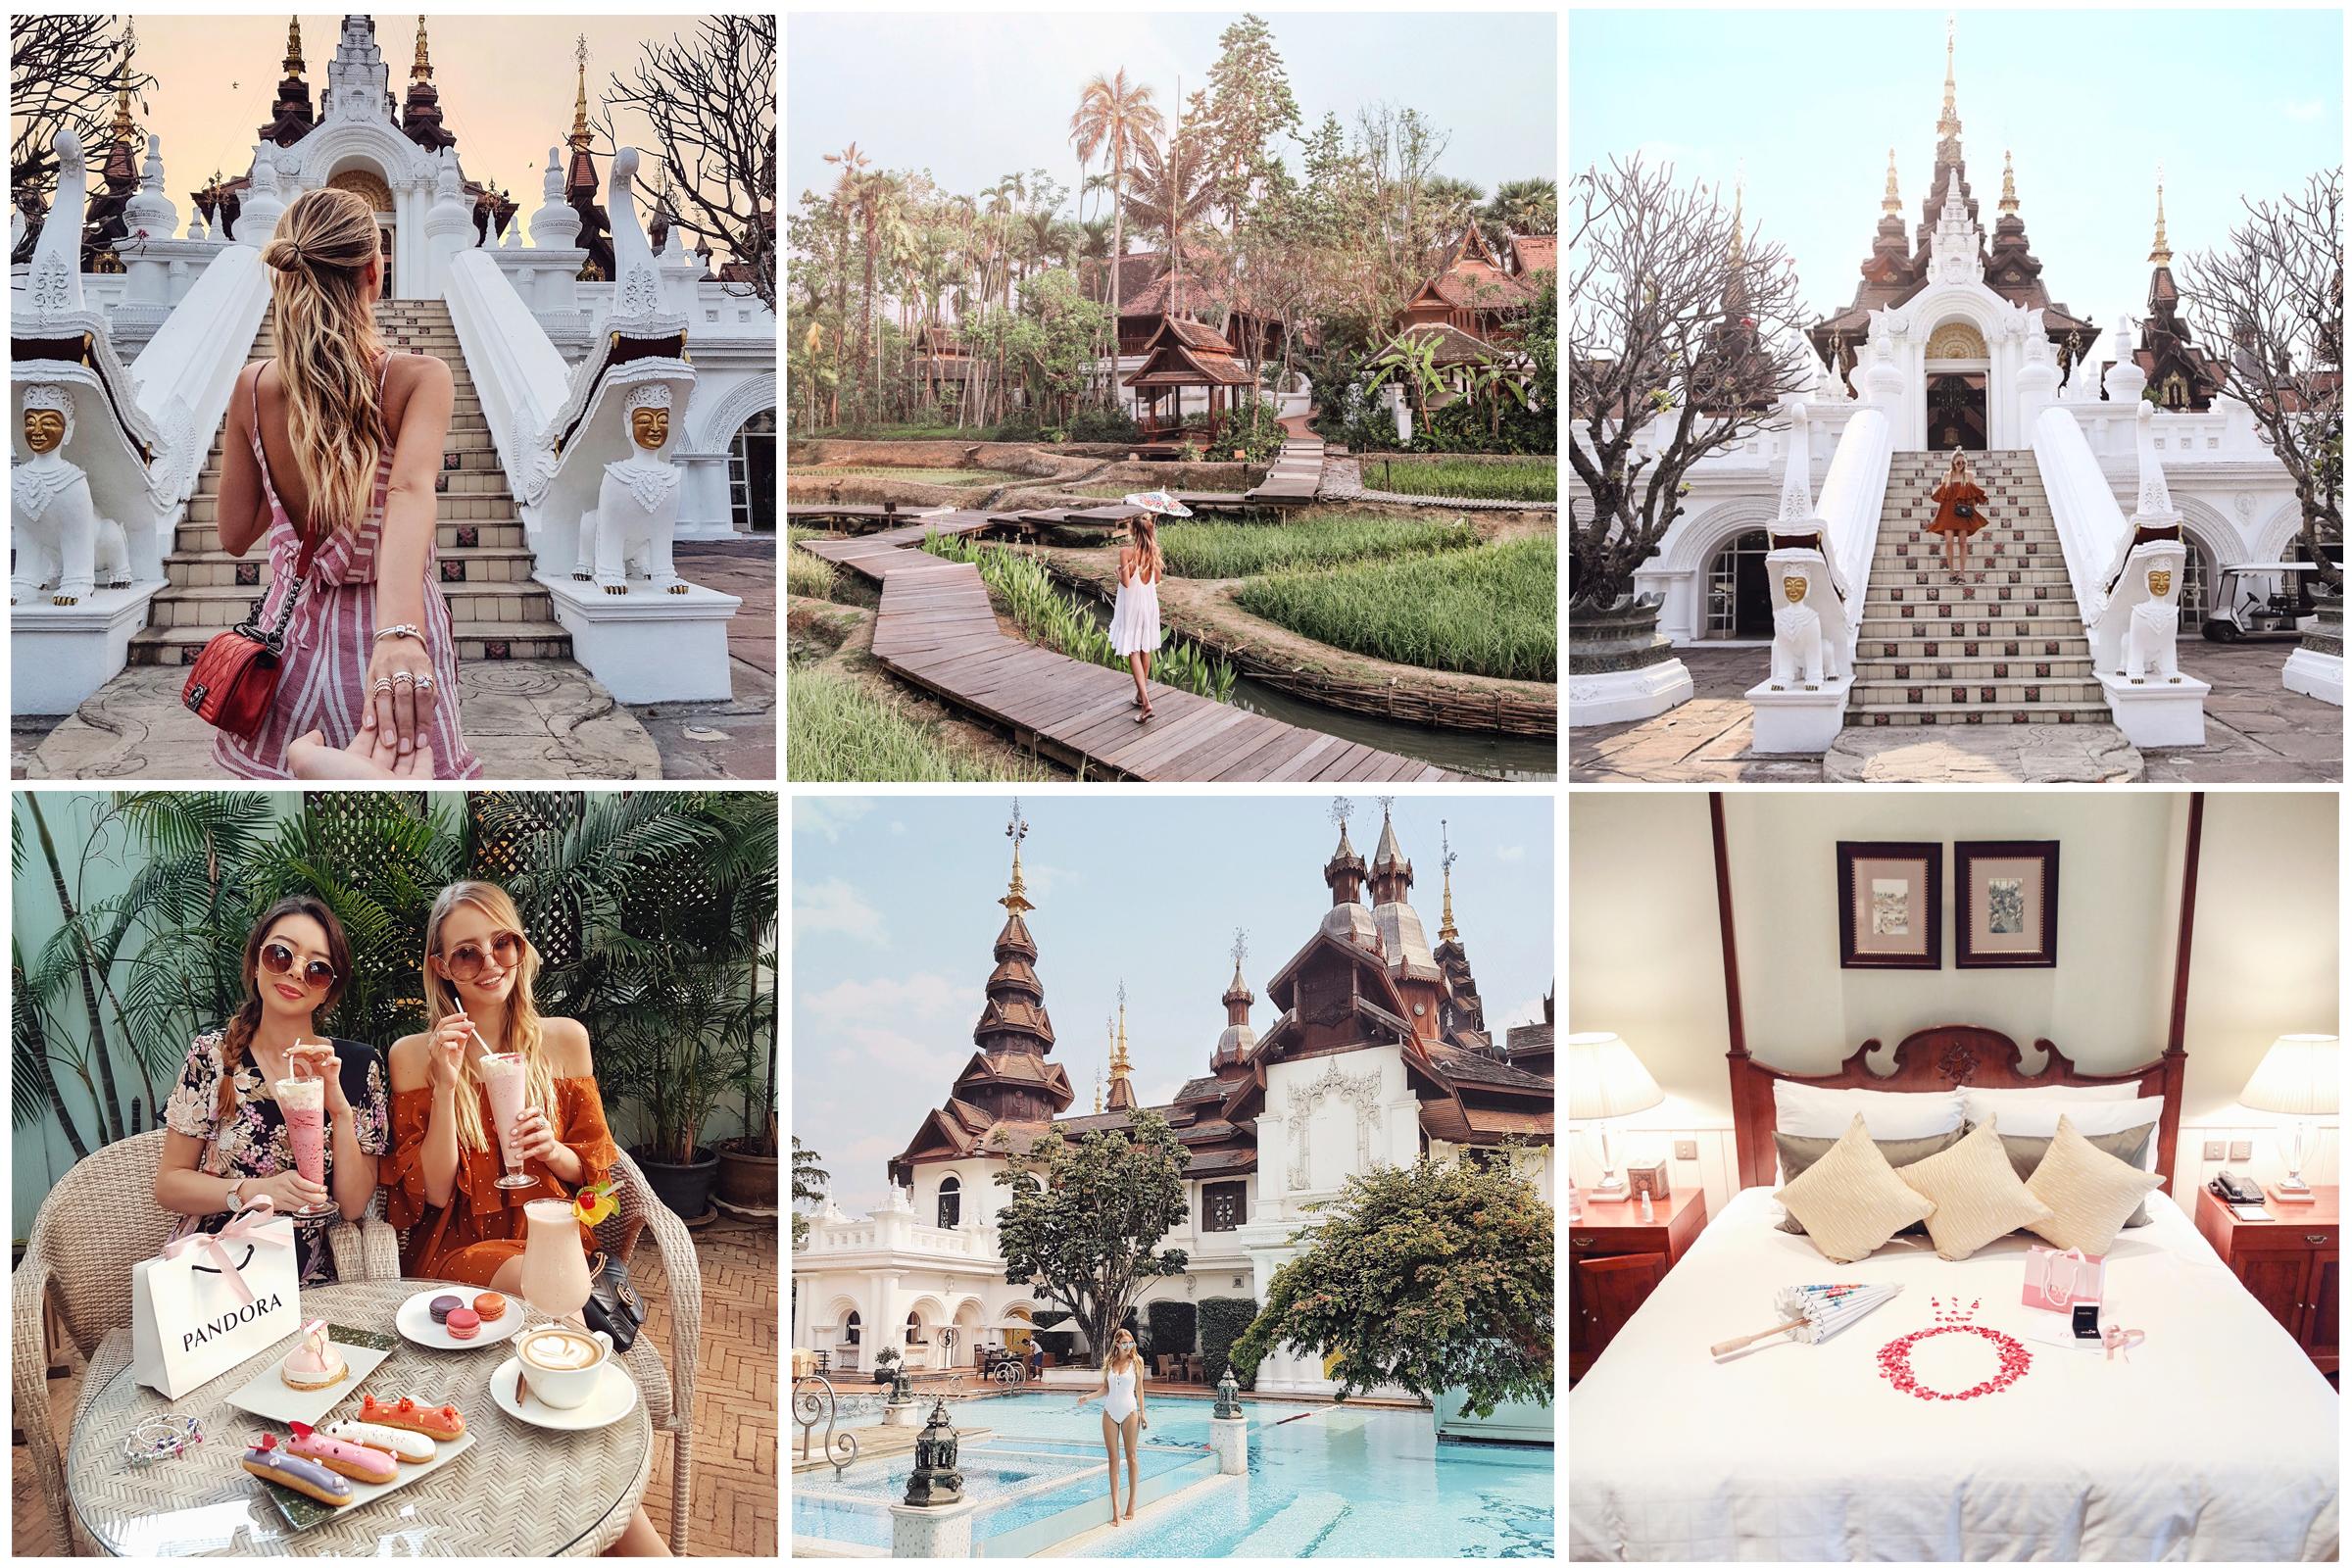 #DOPandora | Thailand